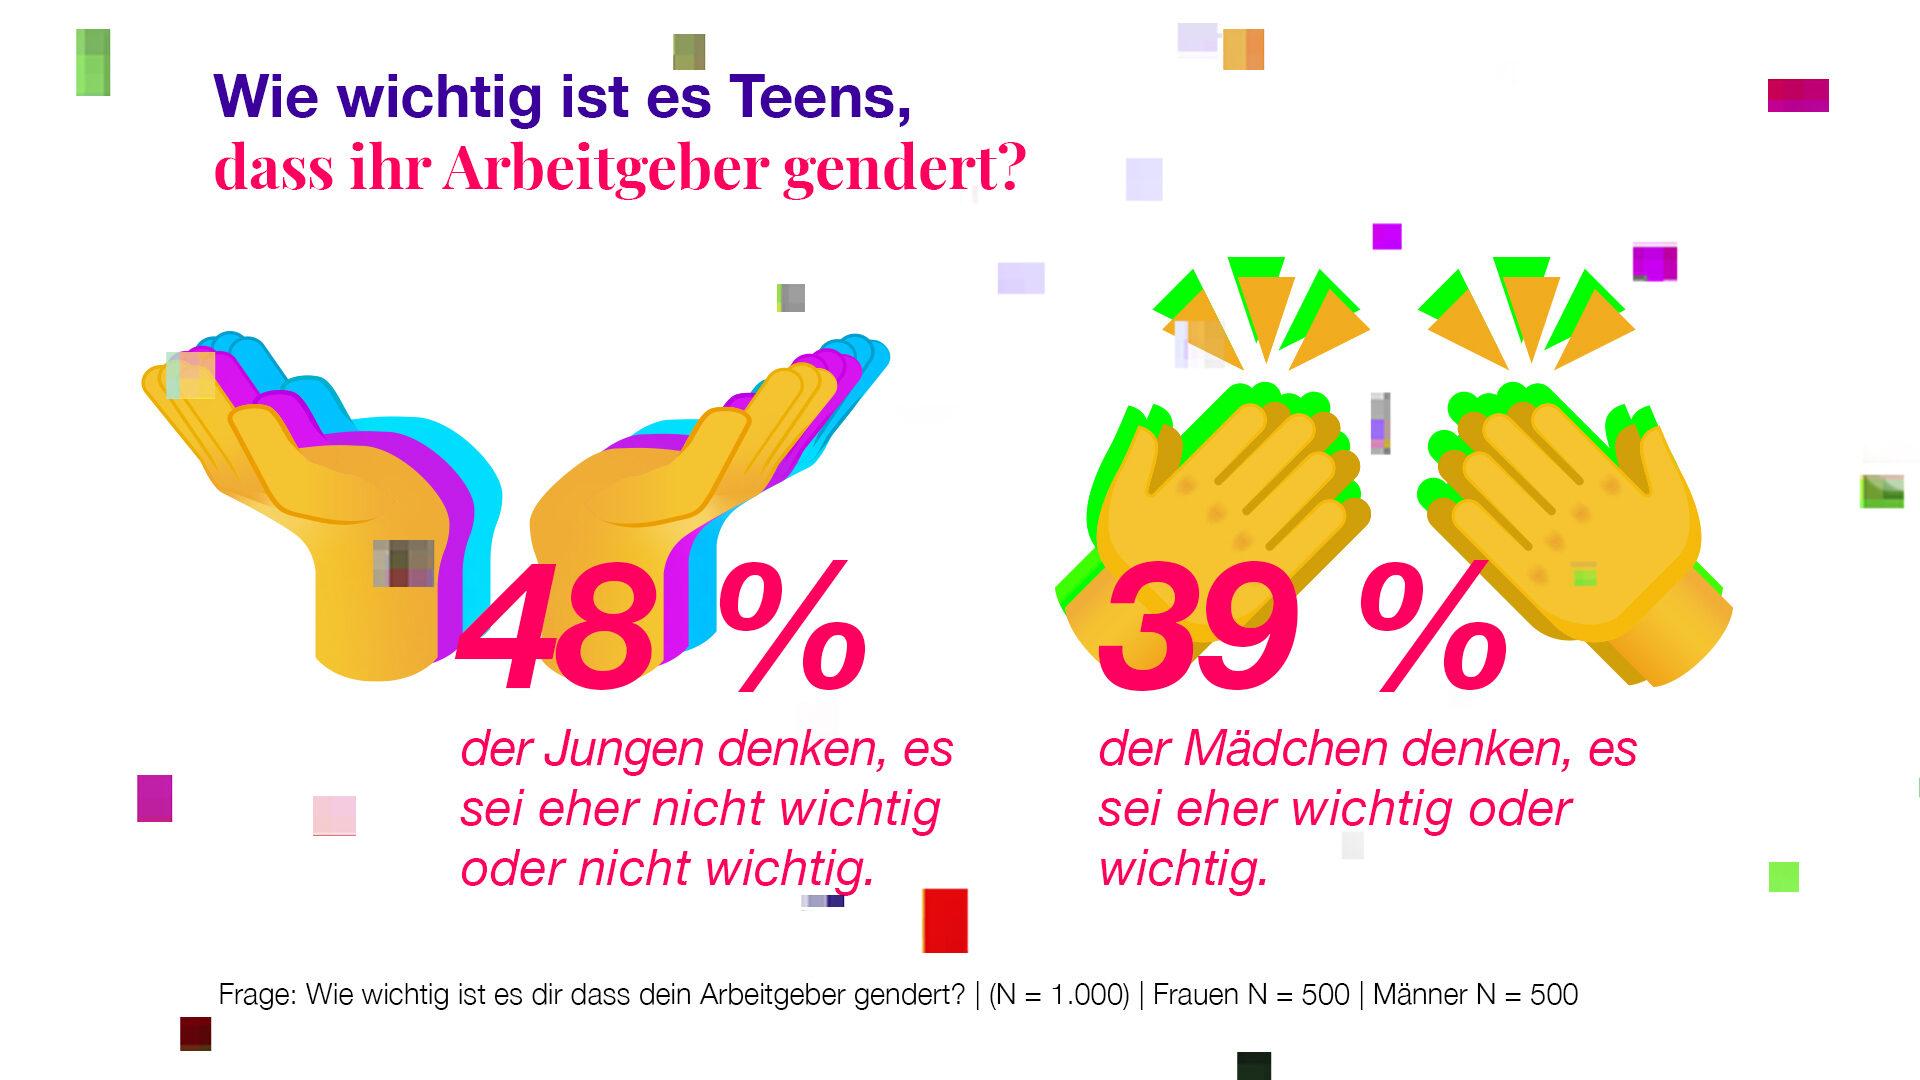 Teengeist-Grafik: Arbeitgeber Gendern